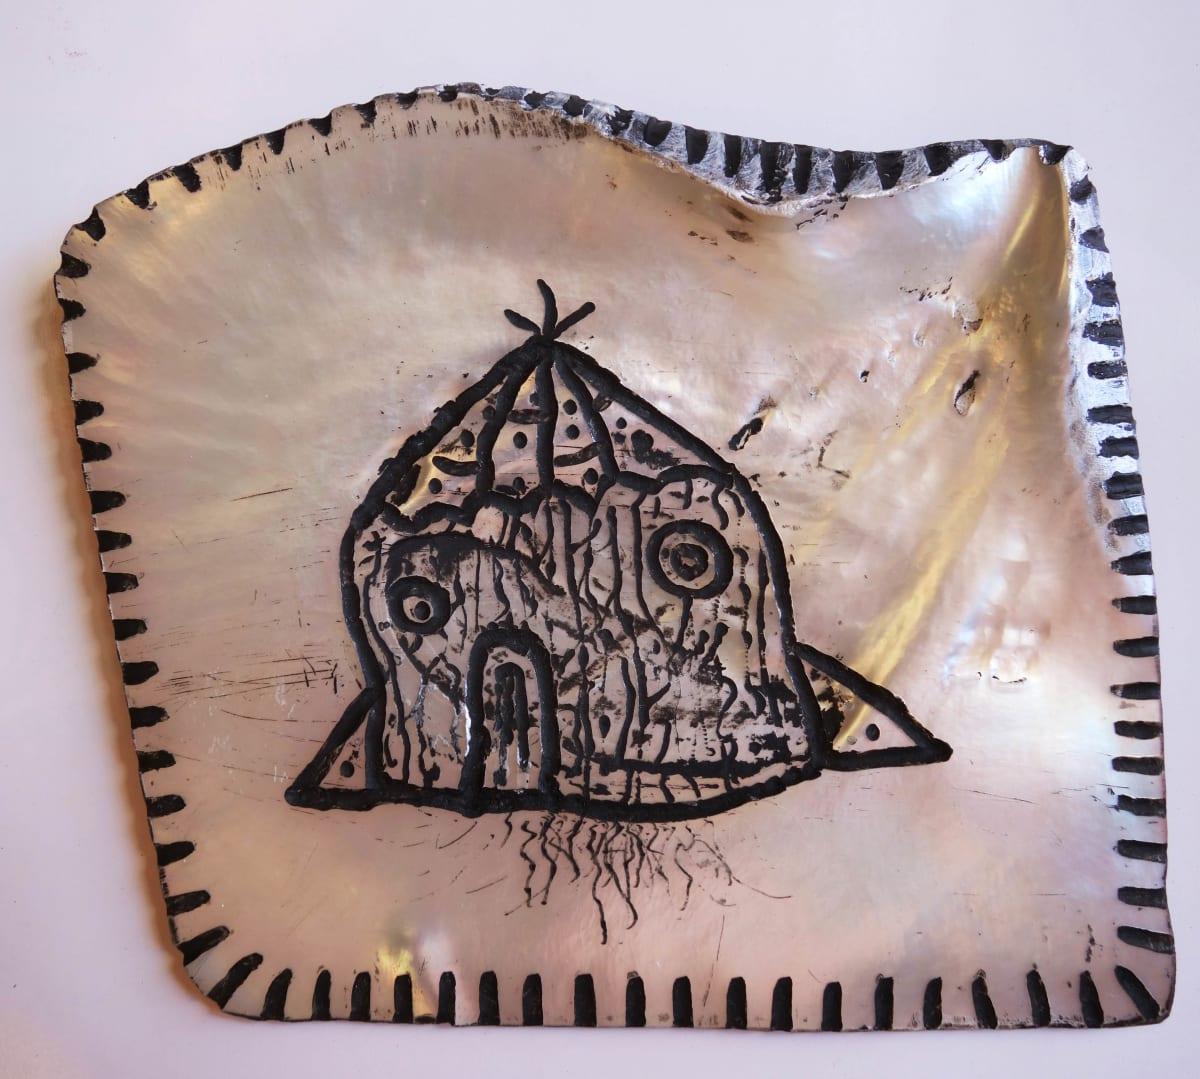 Stephen Eastaugh SHELL-8, 2015 Pearl shell and acrylic